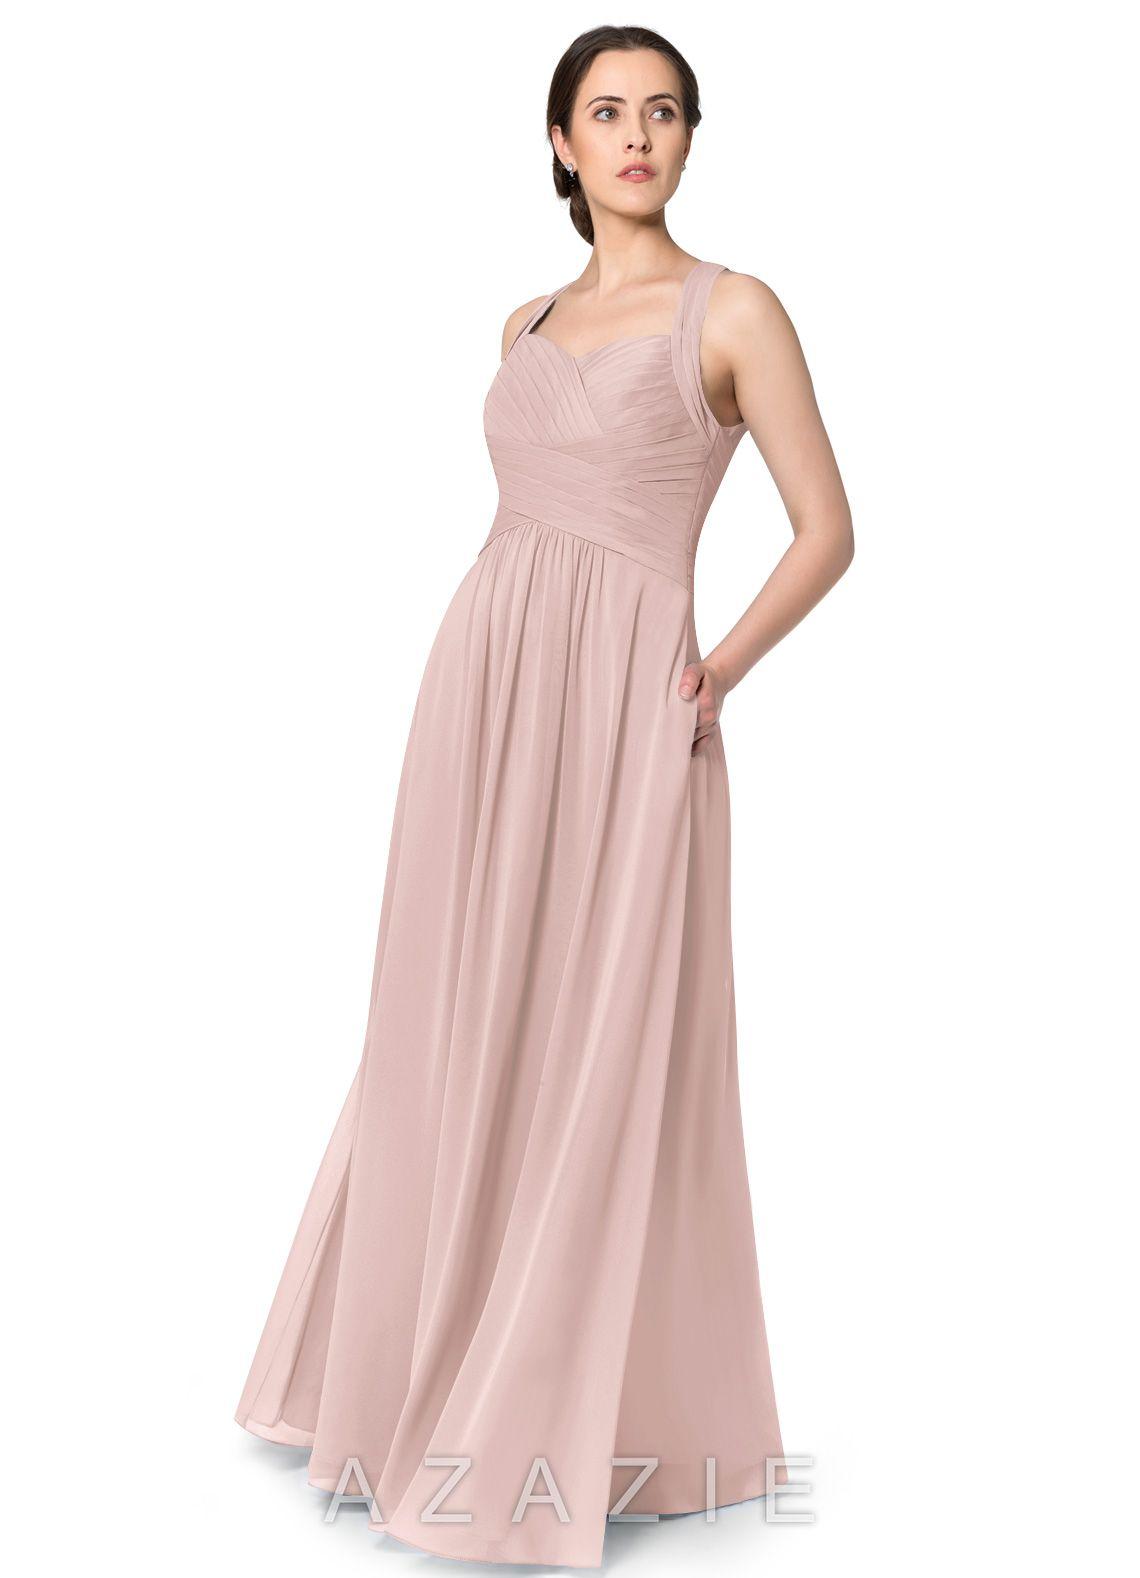 bbeba43b06d Azazie Claudia Bridesmaid Dress - Dusty Rose